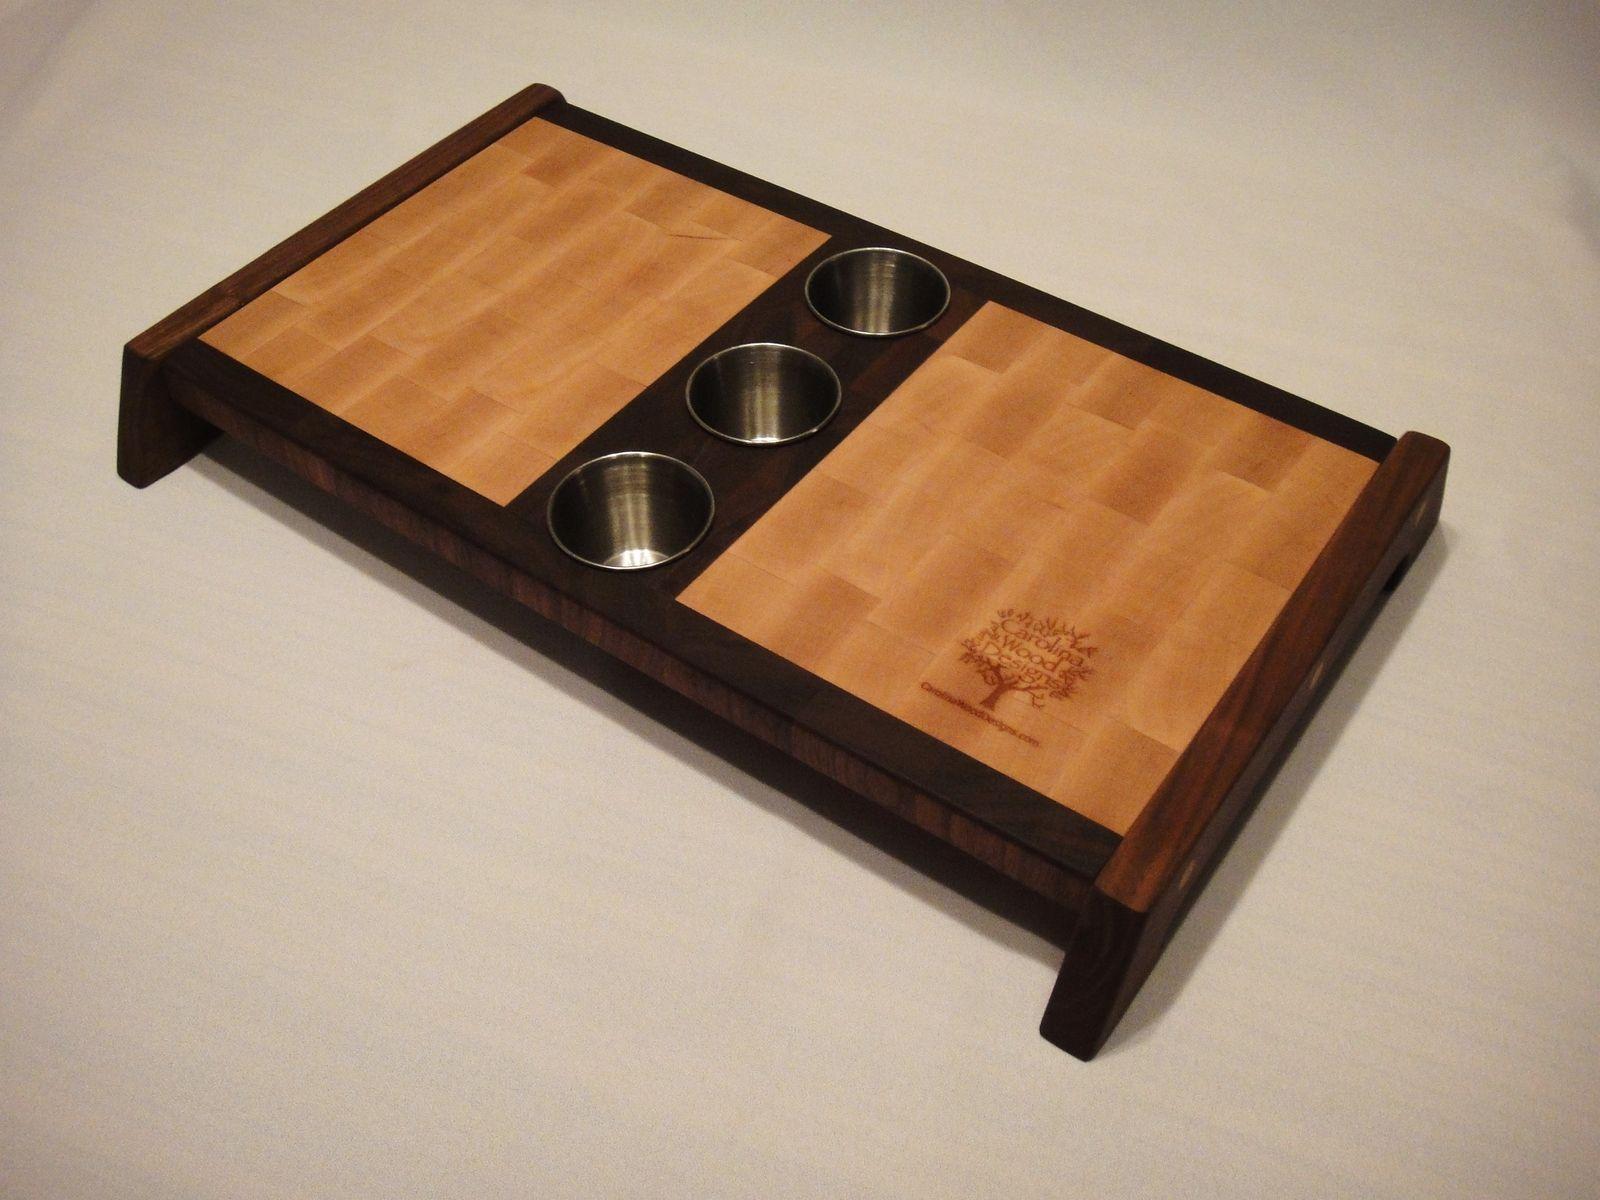 Hand Made Sushi Board By Carolina Wood Designs